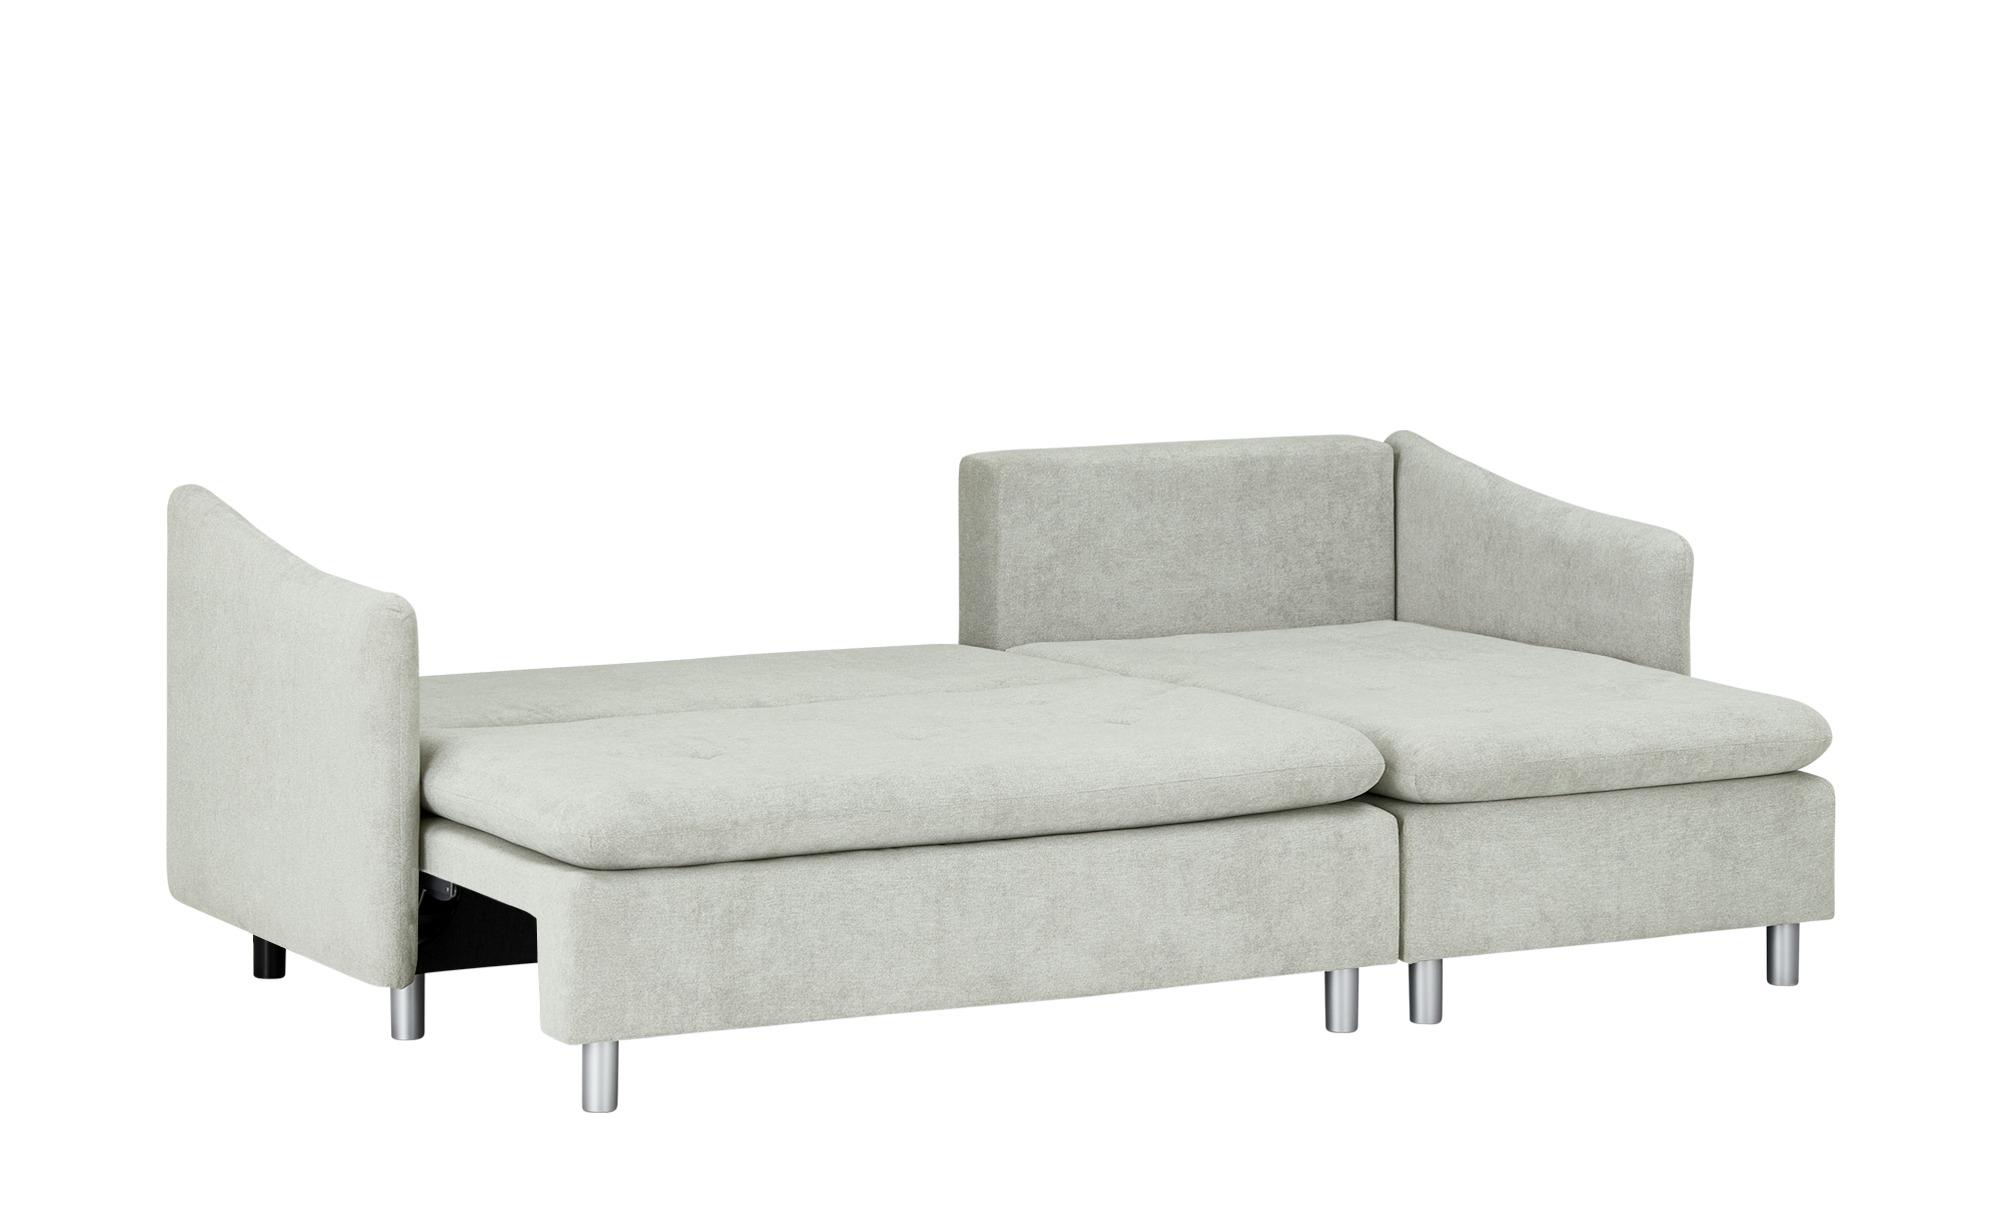 Full Size of Sofa Sitzhöhe 55 Cm Smart Ecksofa Bonamie Silbergrau Grau Stoff Reinigen Günstig Kaufen Ausziehbar Big Xxl Breit Kare Mit Schlaffunktion Relaxfunktion Regal Sofa Sofa Sitzhöhe 55 Cm